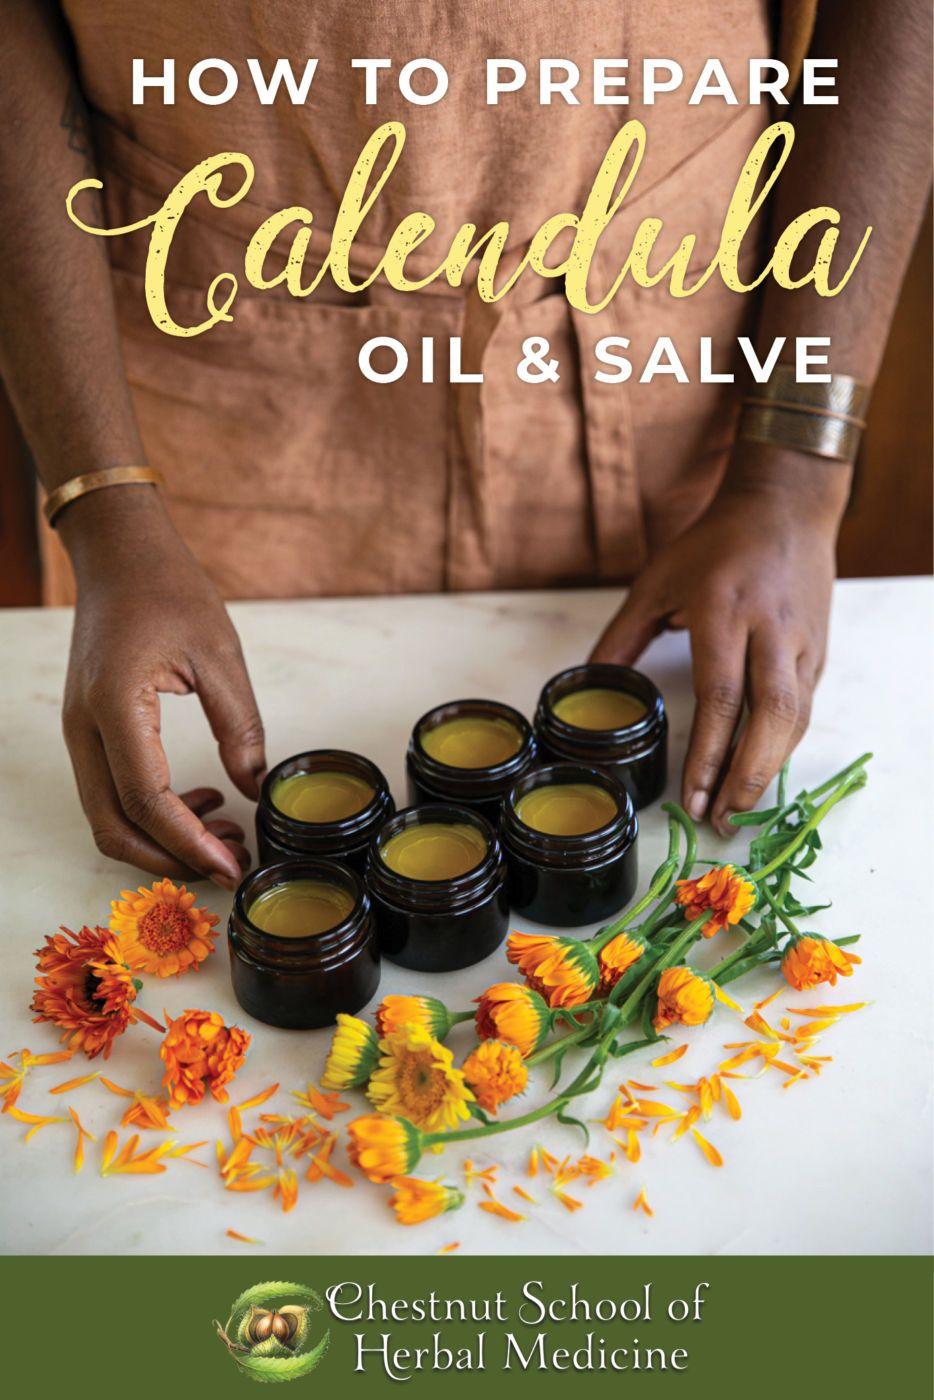 Calendula's Benefits for the Skin How to Make Calendula